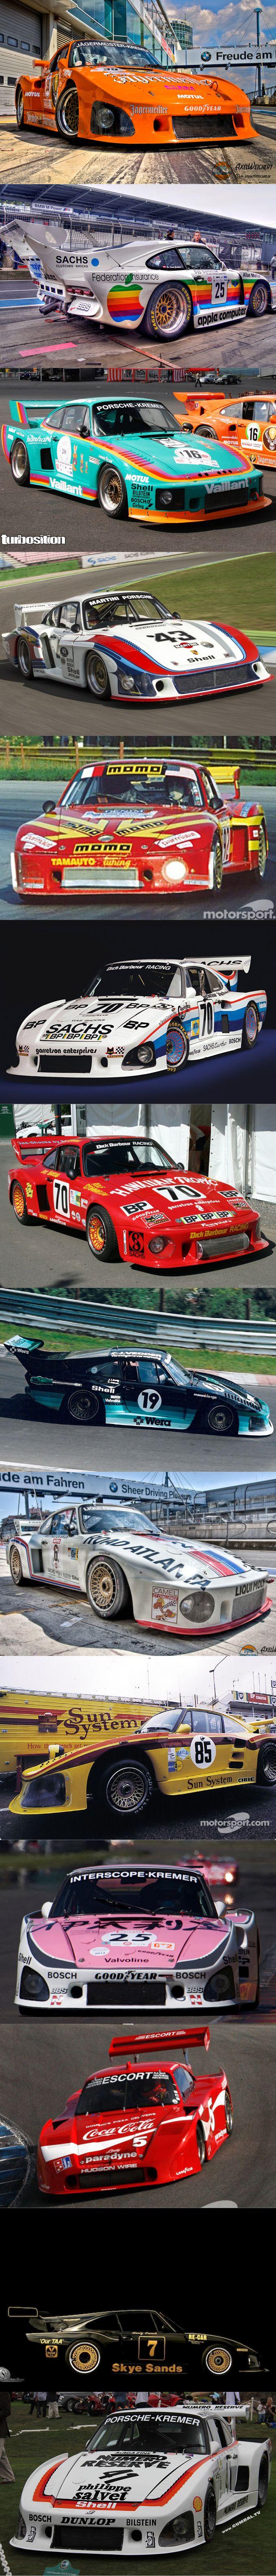 1978 Porsche 935 group 5 liveries / Jägermeister / Apple / Vaillant / Martini / Momo / Sachs / Hawaiian Tropic / Wera / Liqui Moly / Sun / Italya / Coca Cola / Skye Sands / Philippe Salvet / Kremer K3 / Germany